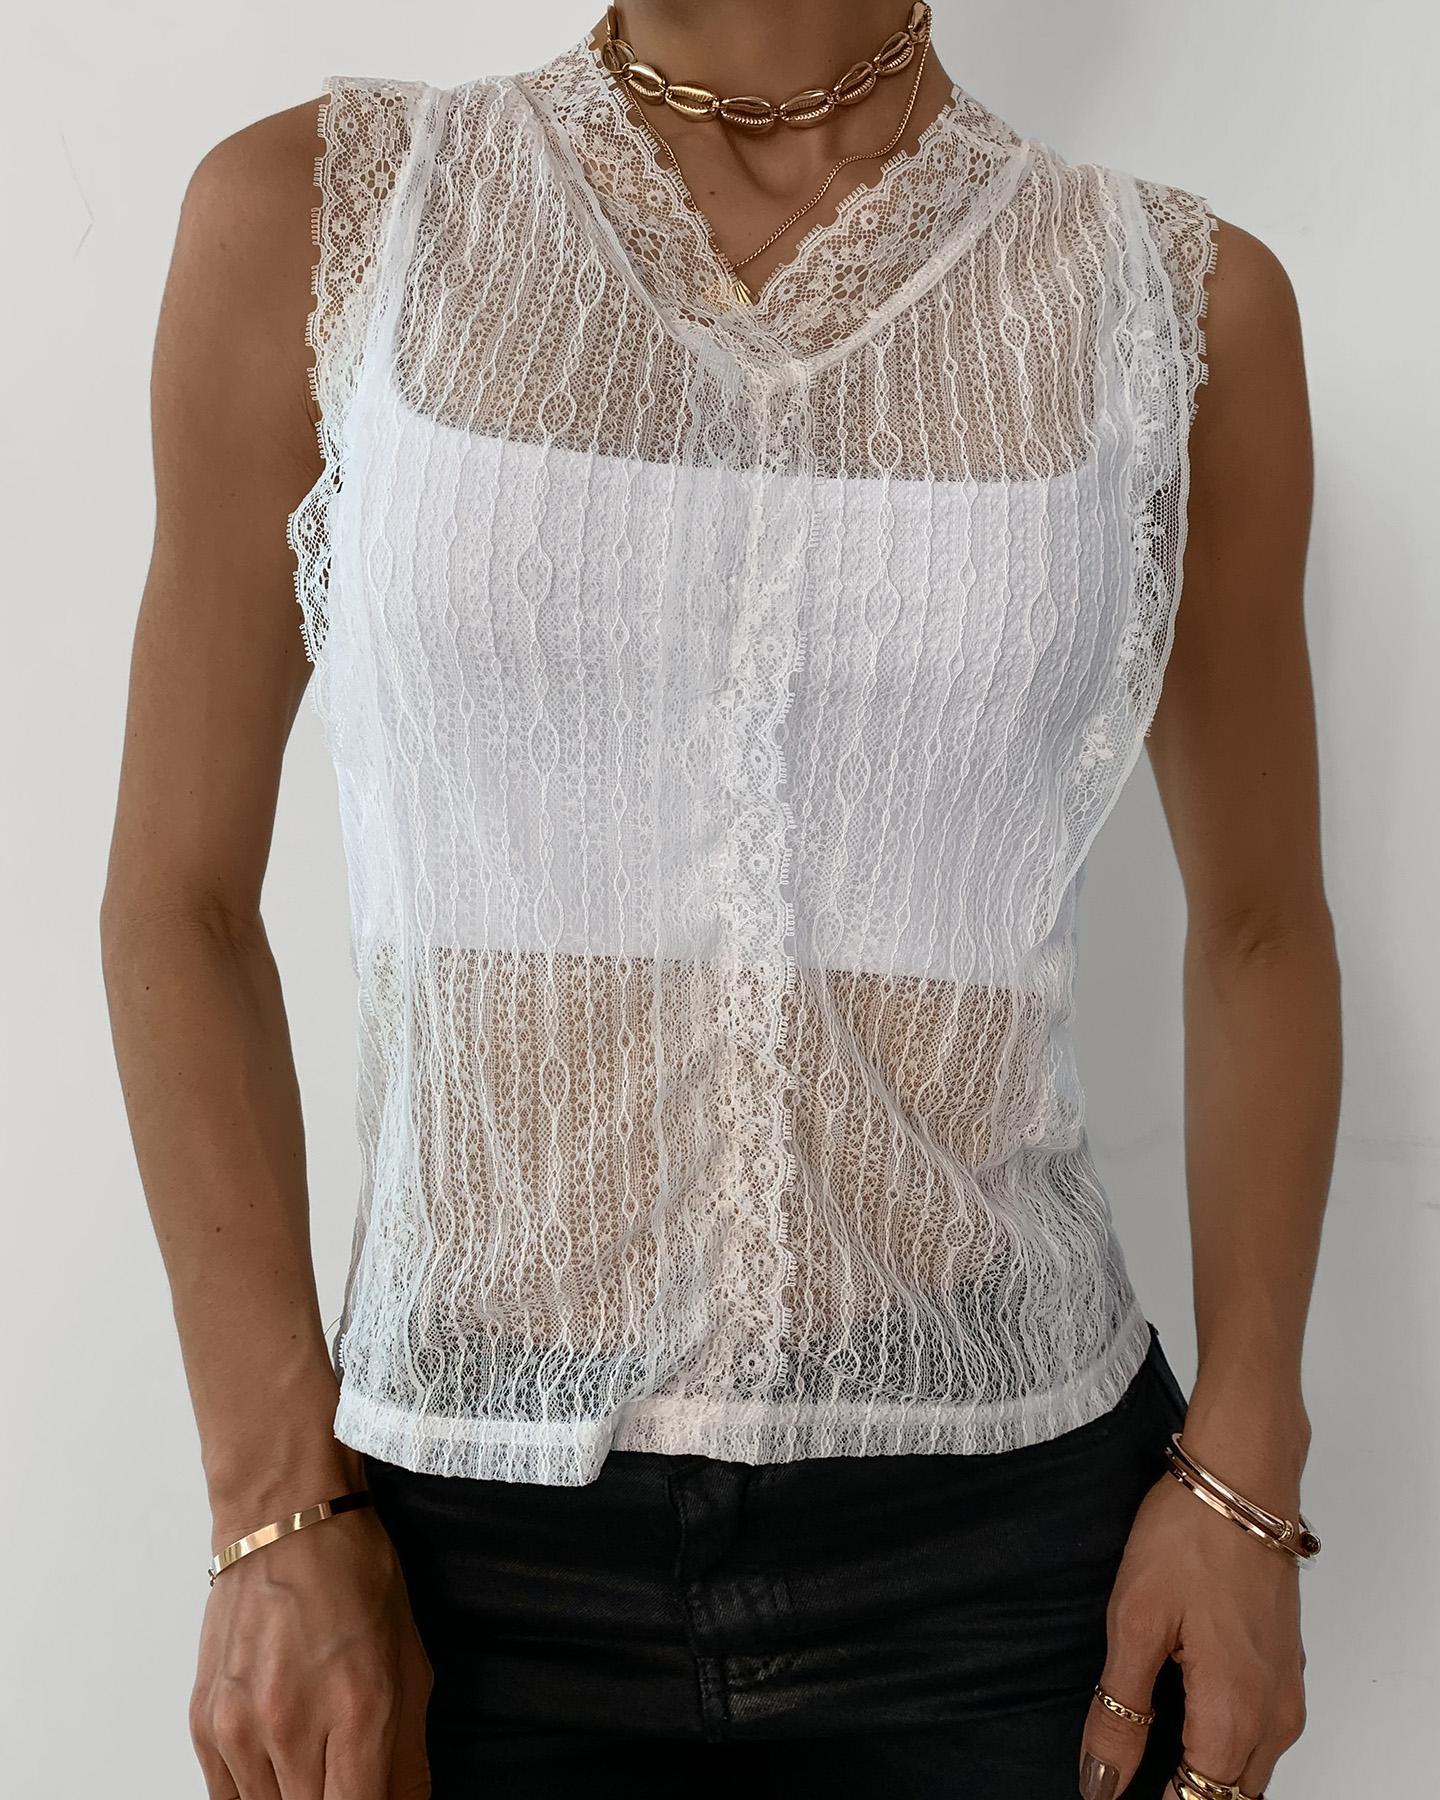 Eyelash Crochet Lace Sheer Mesh Top фото